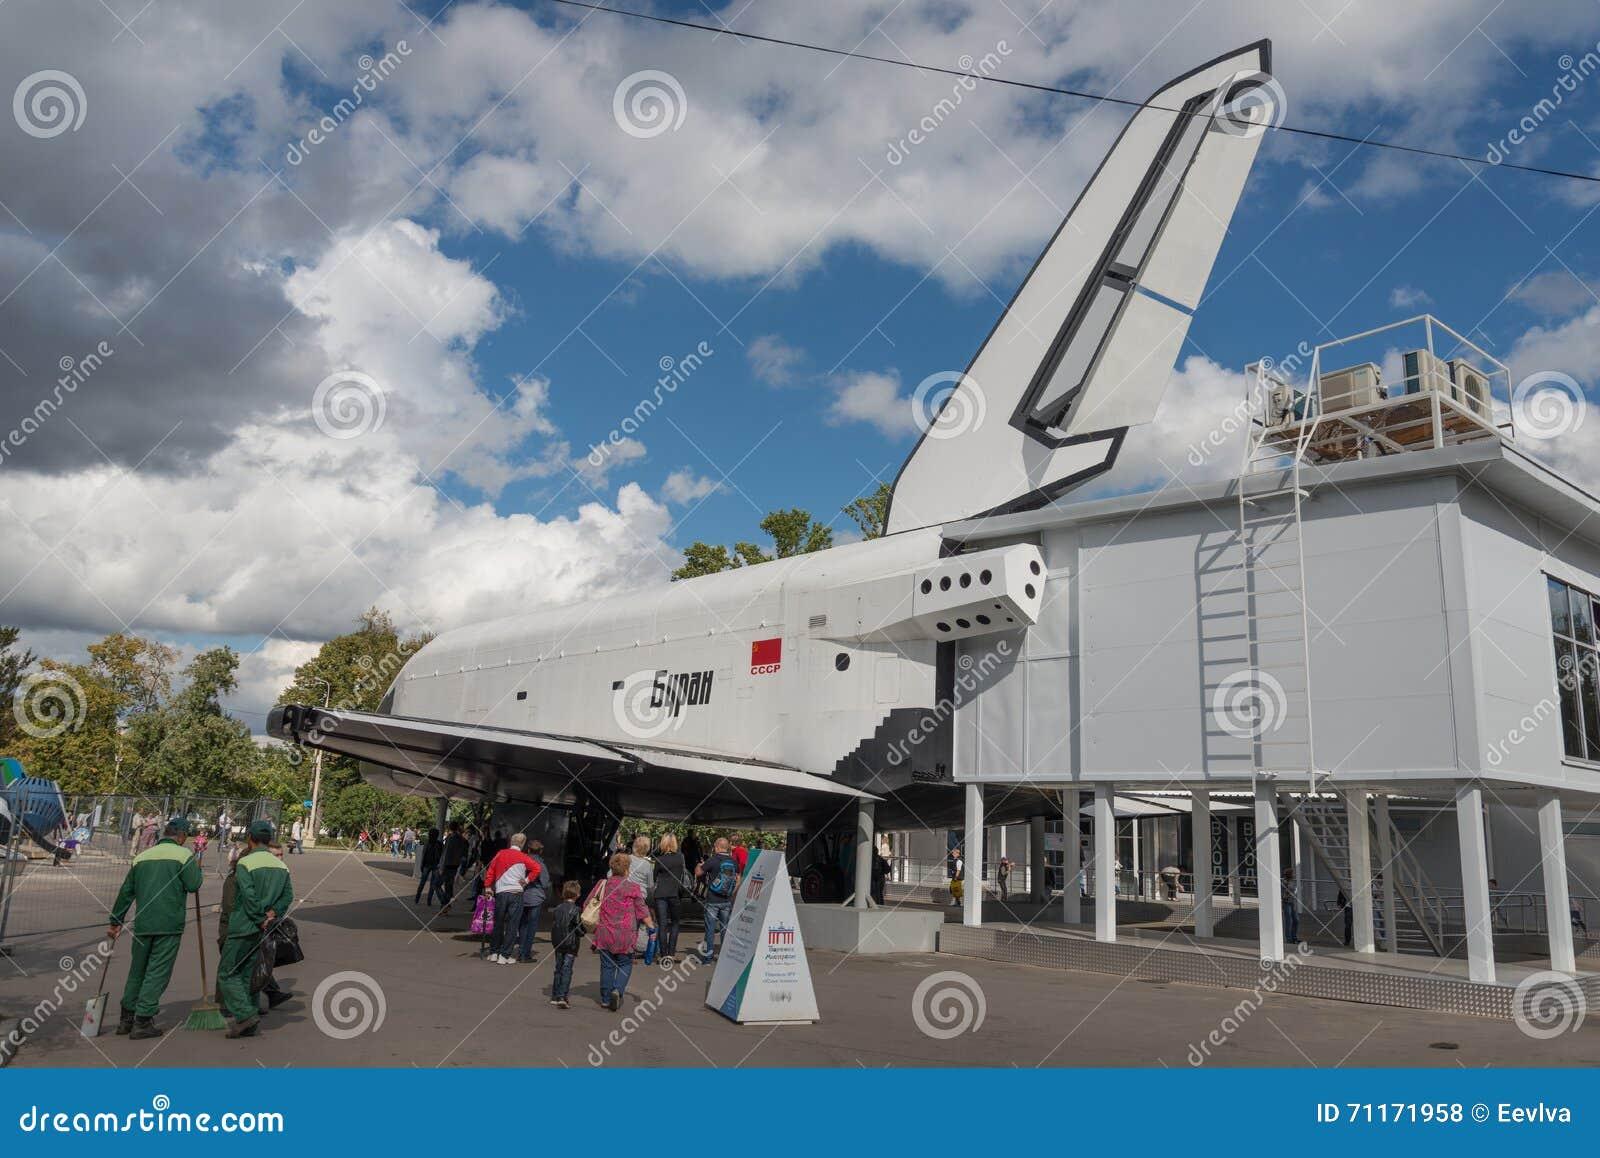 1st space shuttle flight - photo #35